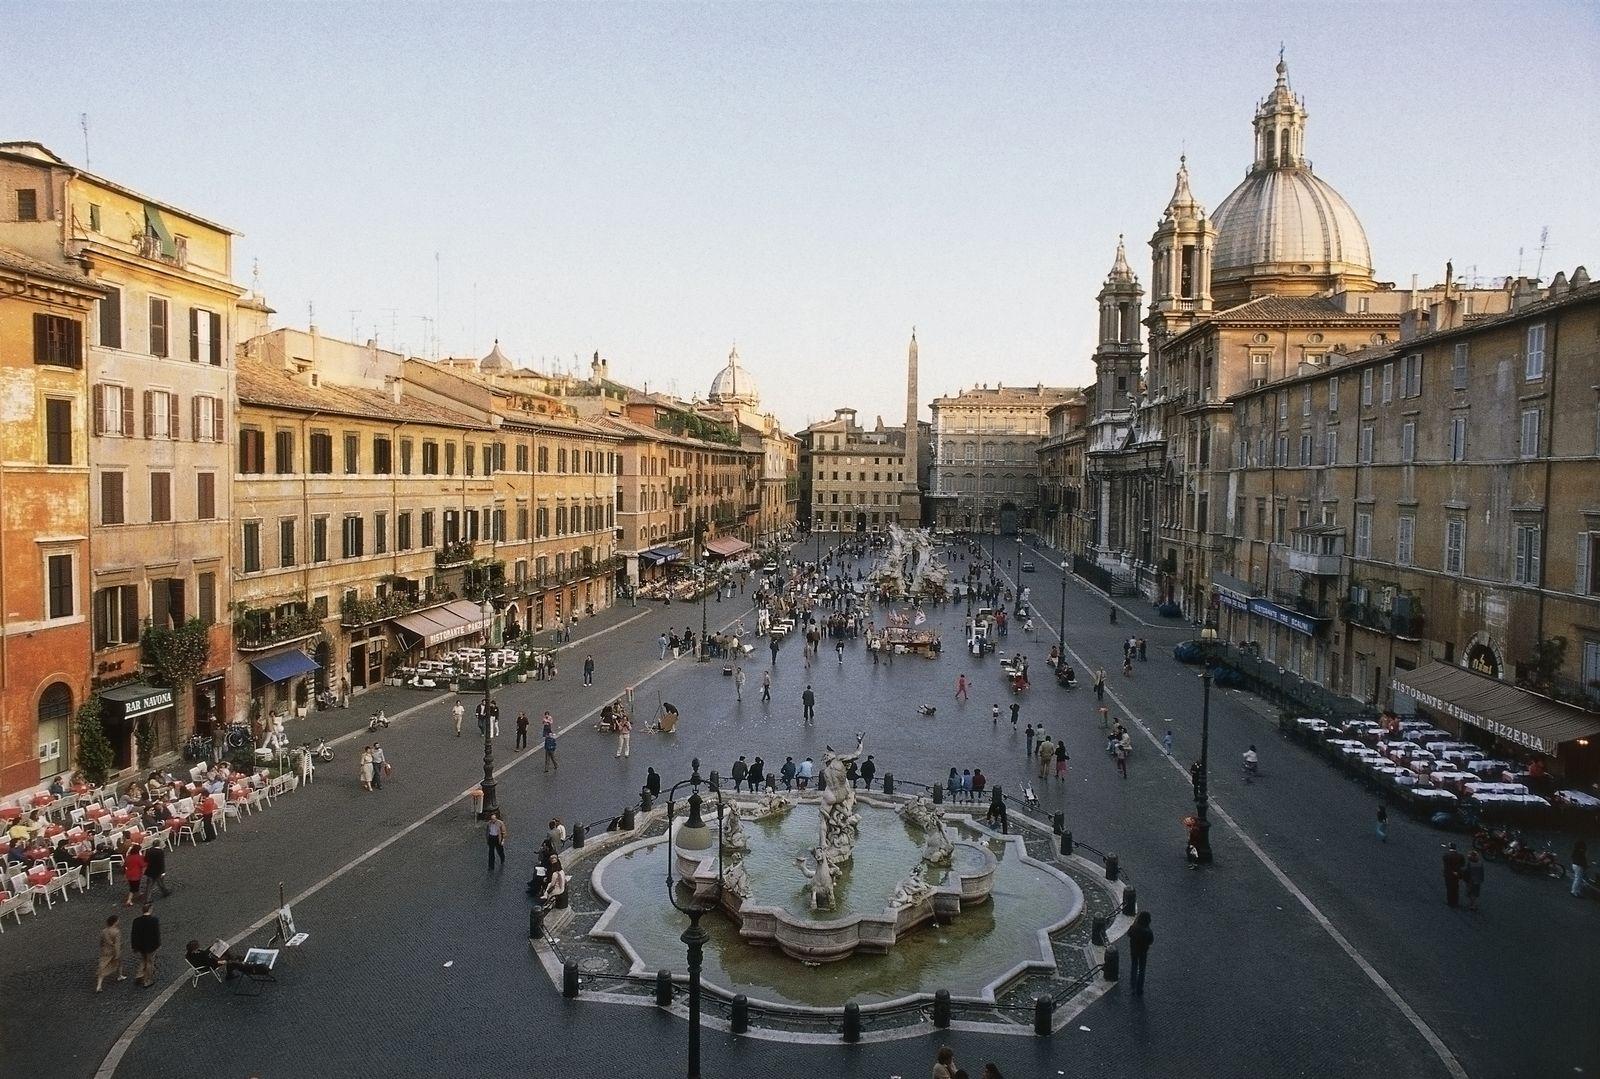 EINMALIGE VERWENDUNG Rom Kulturdenkmal / Piazza Navona with the Fountain